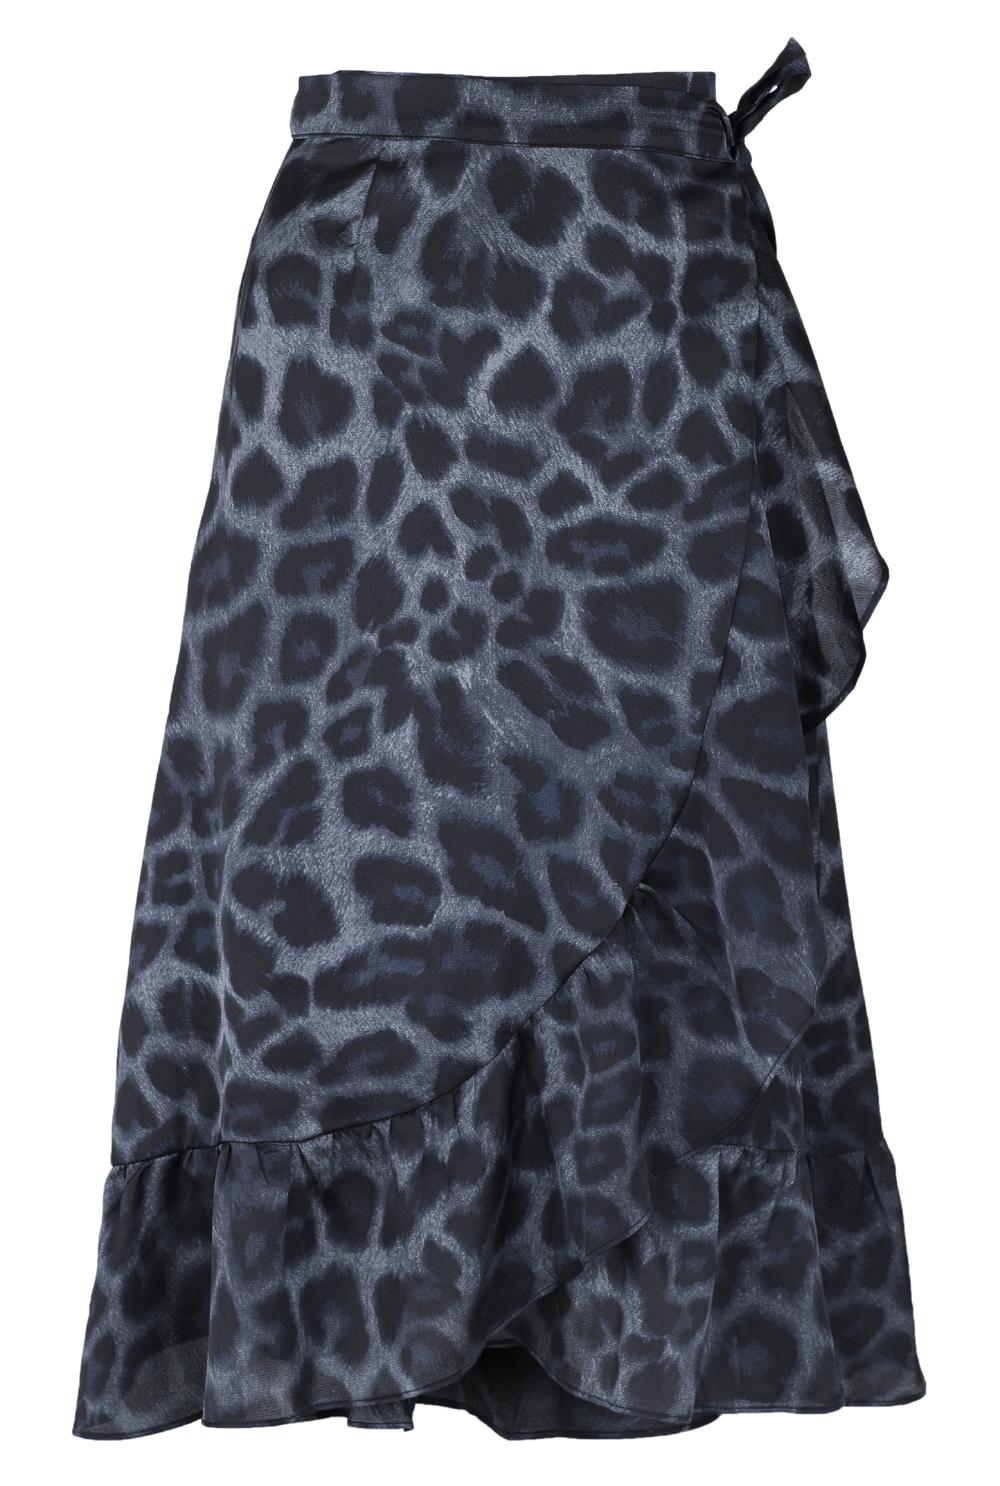 neo-noir-mika-leo-wrap-skirt-blue-leopard 1